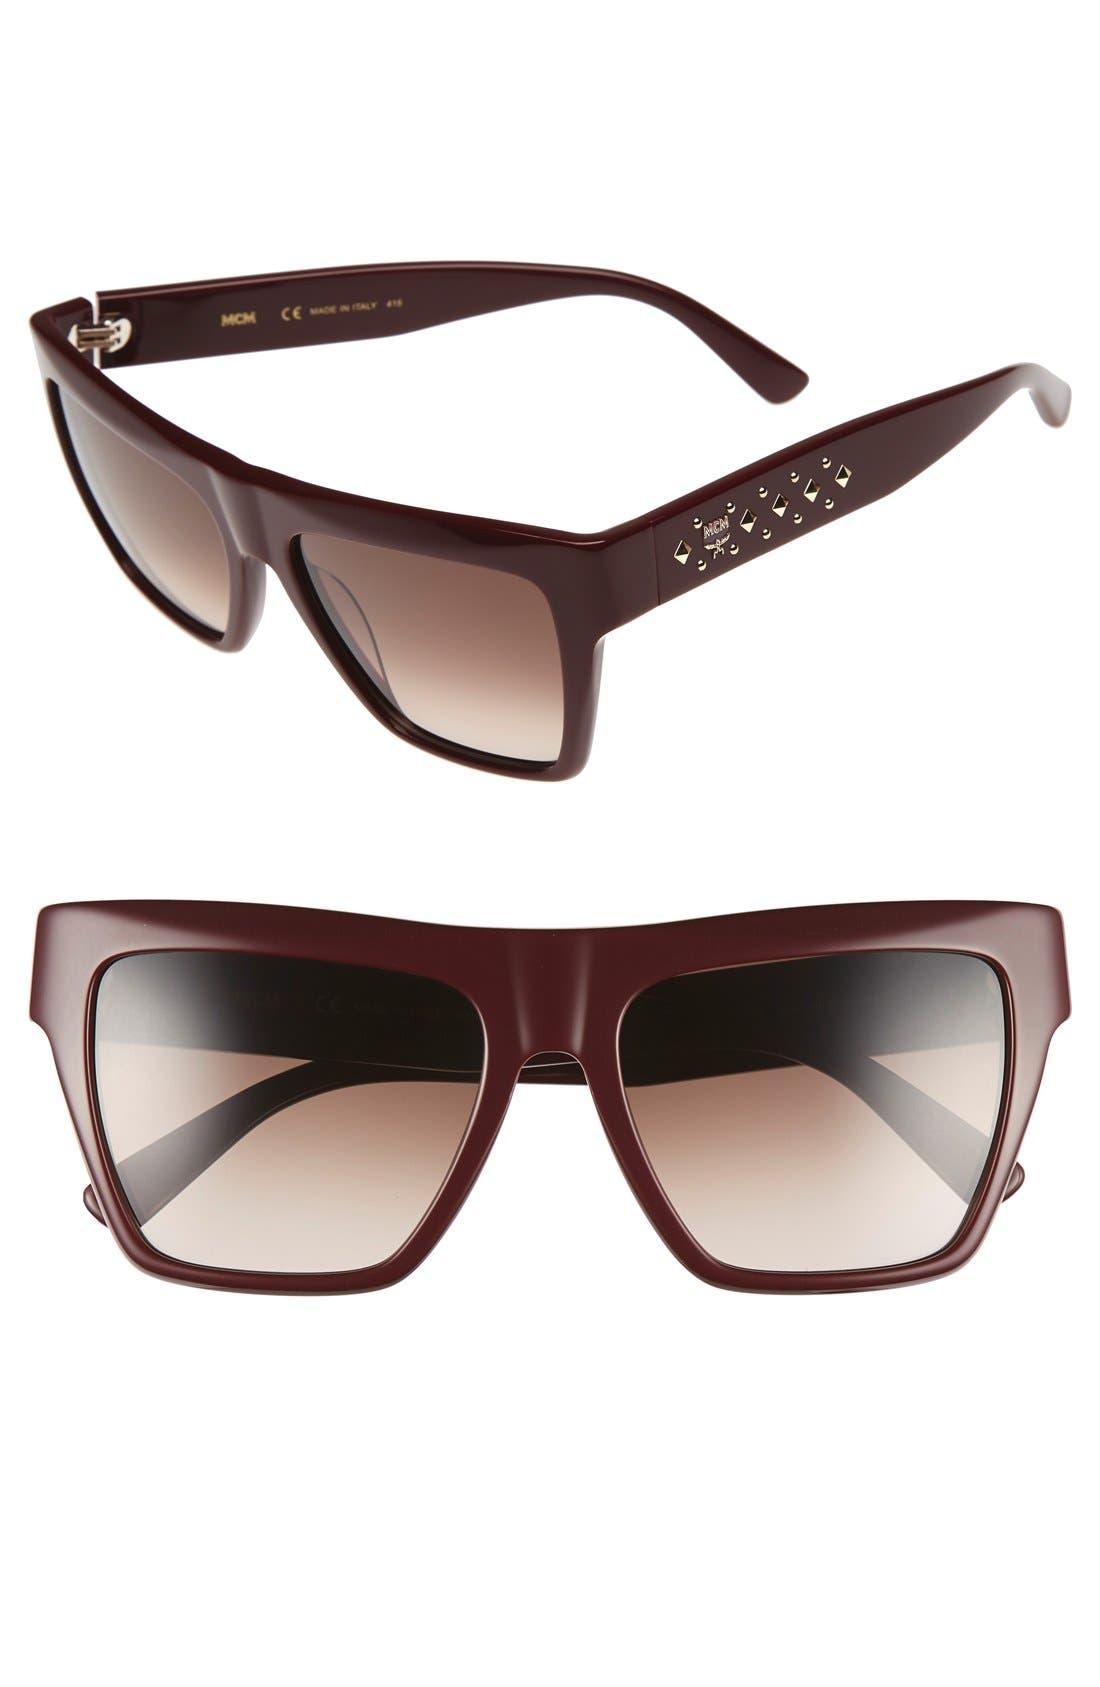 Alternate Image 1 Selected - MCM 55mm Studded Navigator Sunglasses